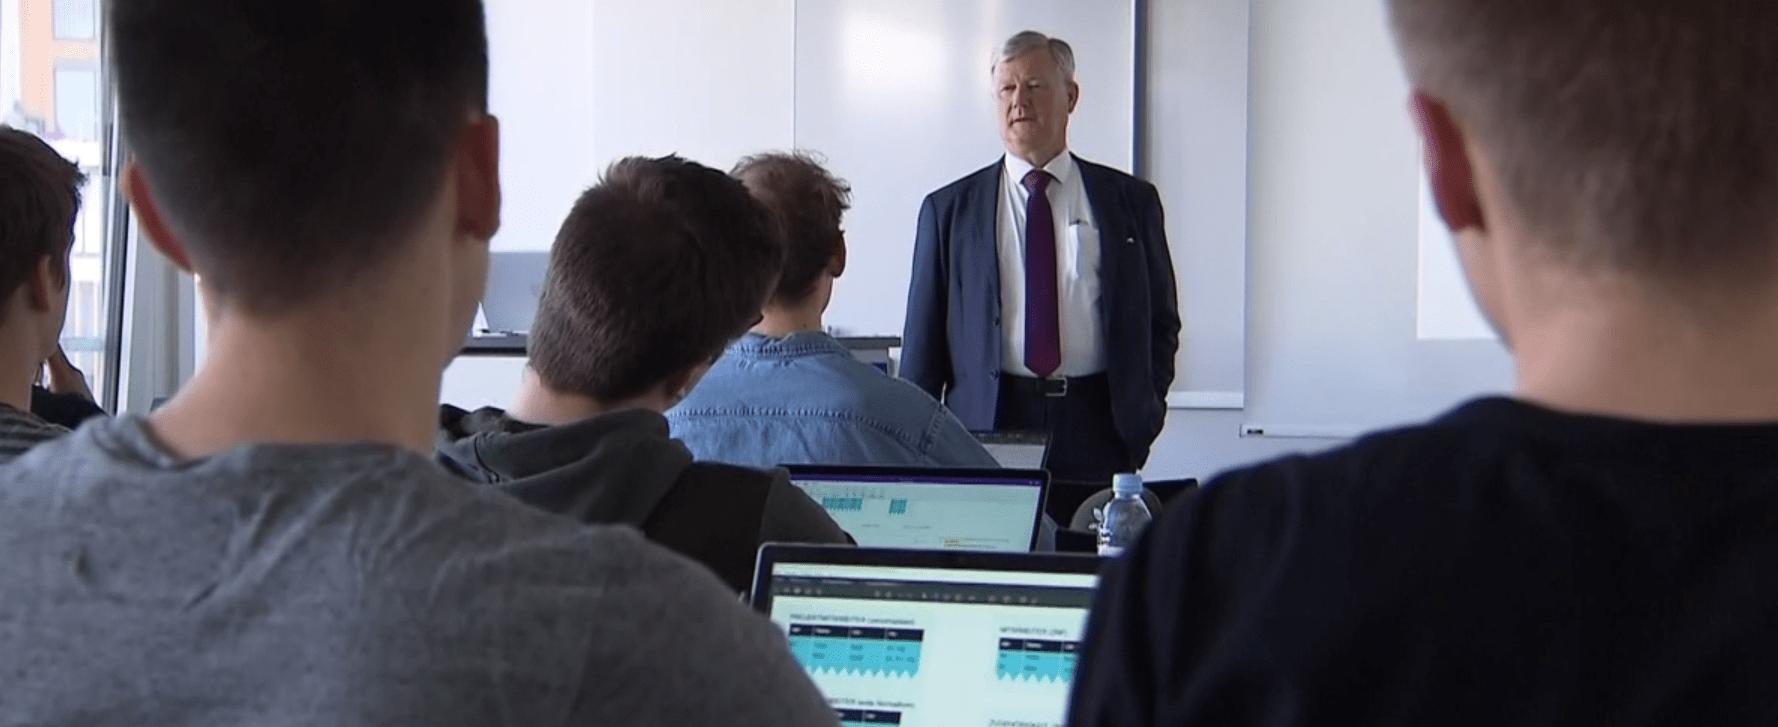 Cyber-Security-Studiengang auf dem Vormarsch